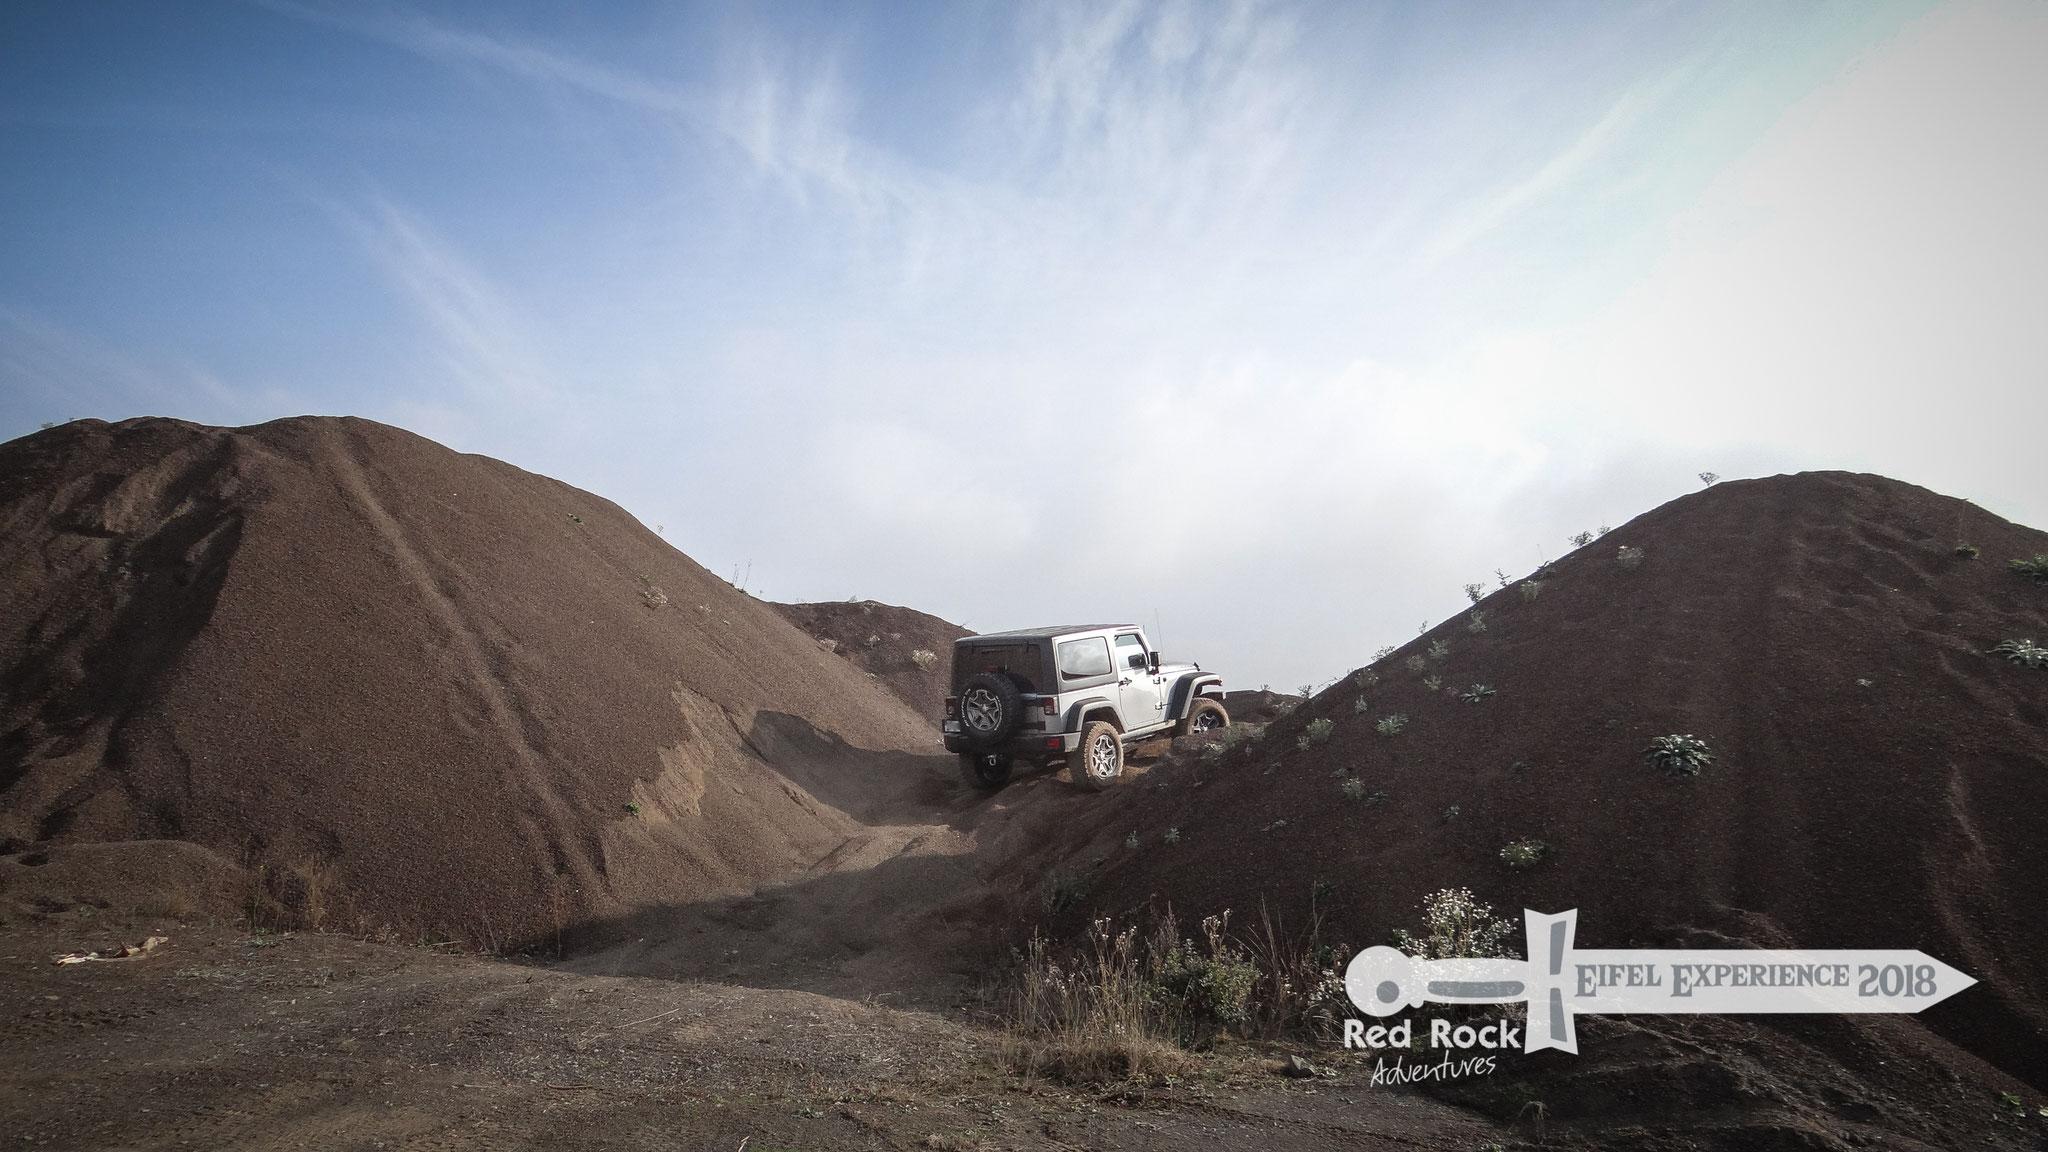 Red Rock Adventures - Eifel Experience - Oktober 2018